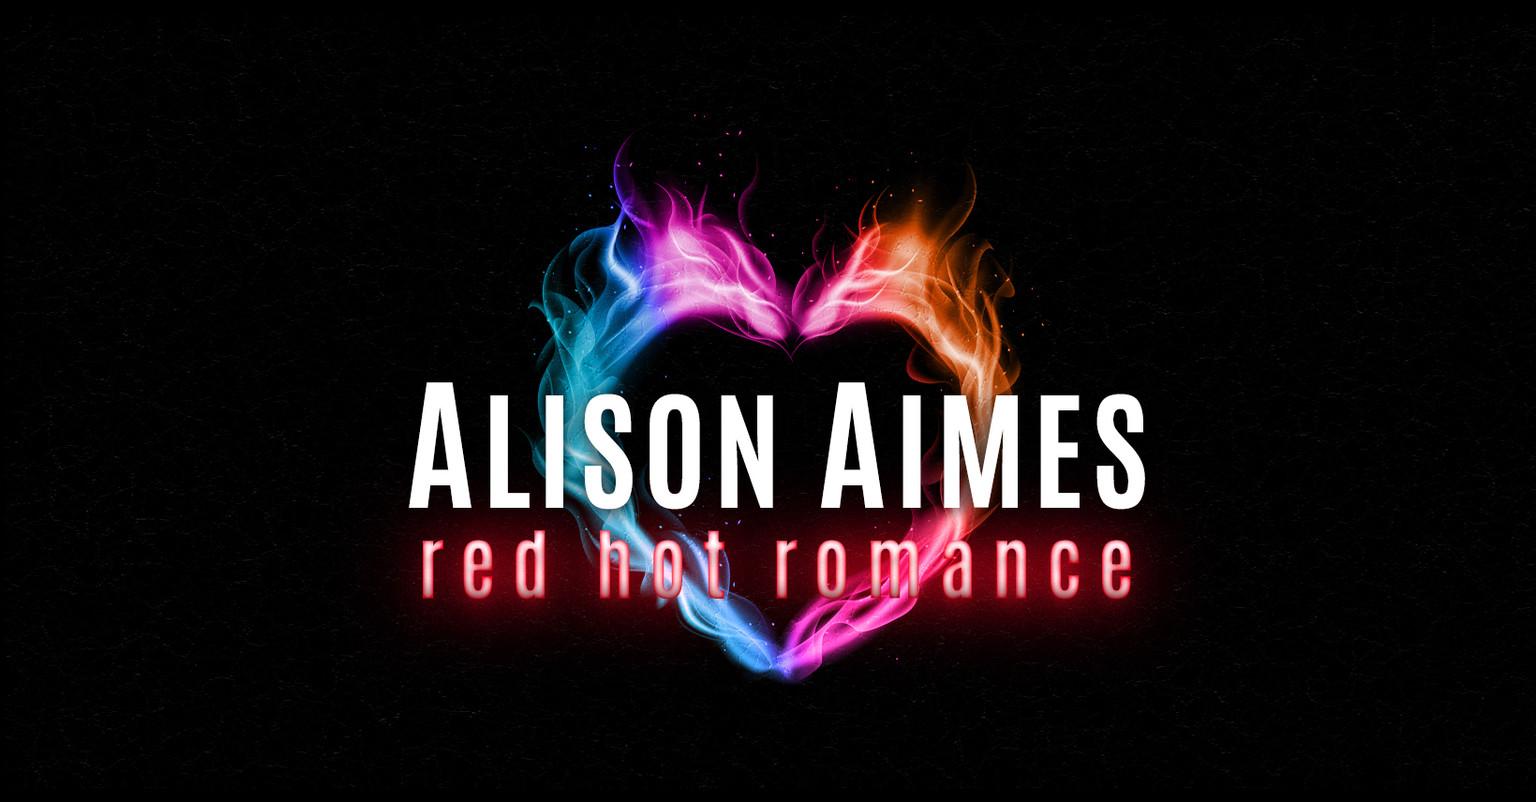 Alison Aimes - FB group.jpg